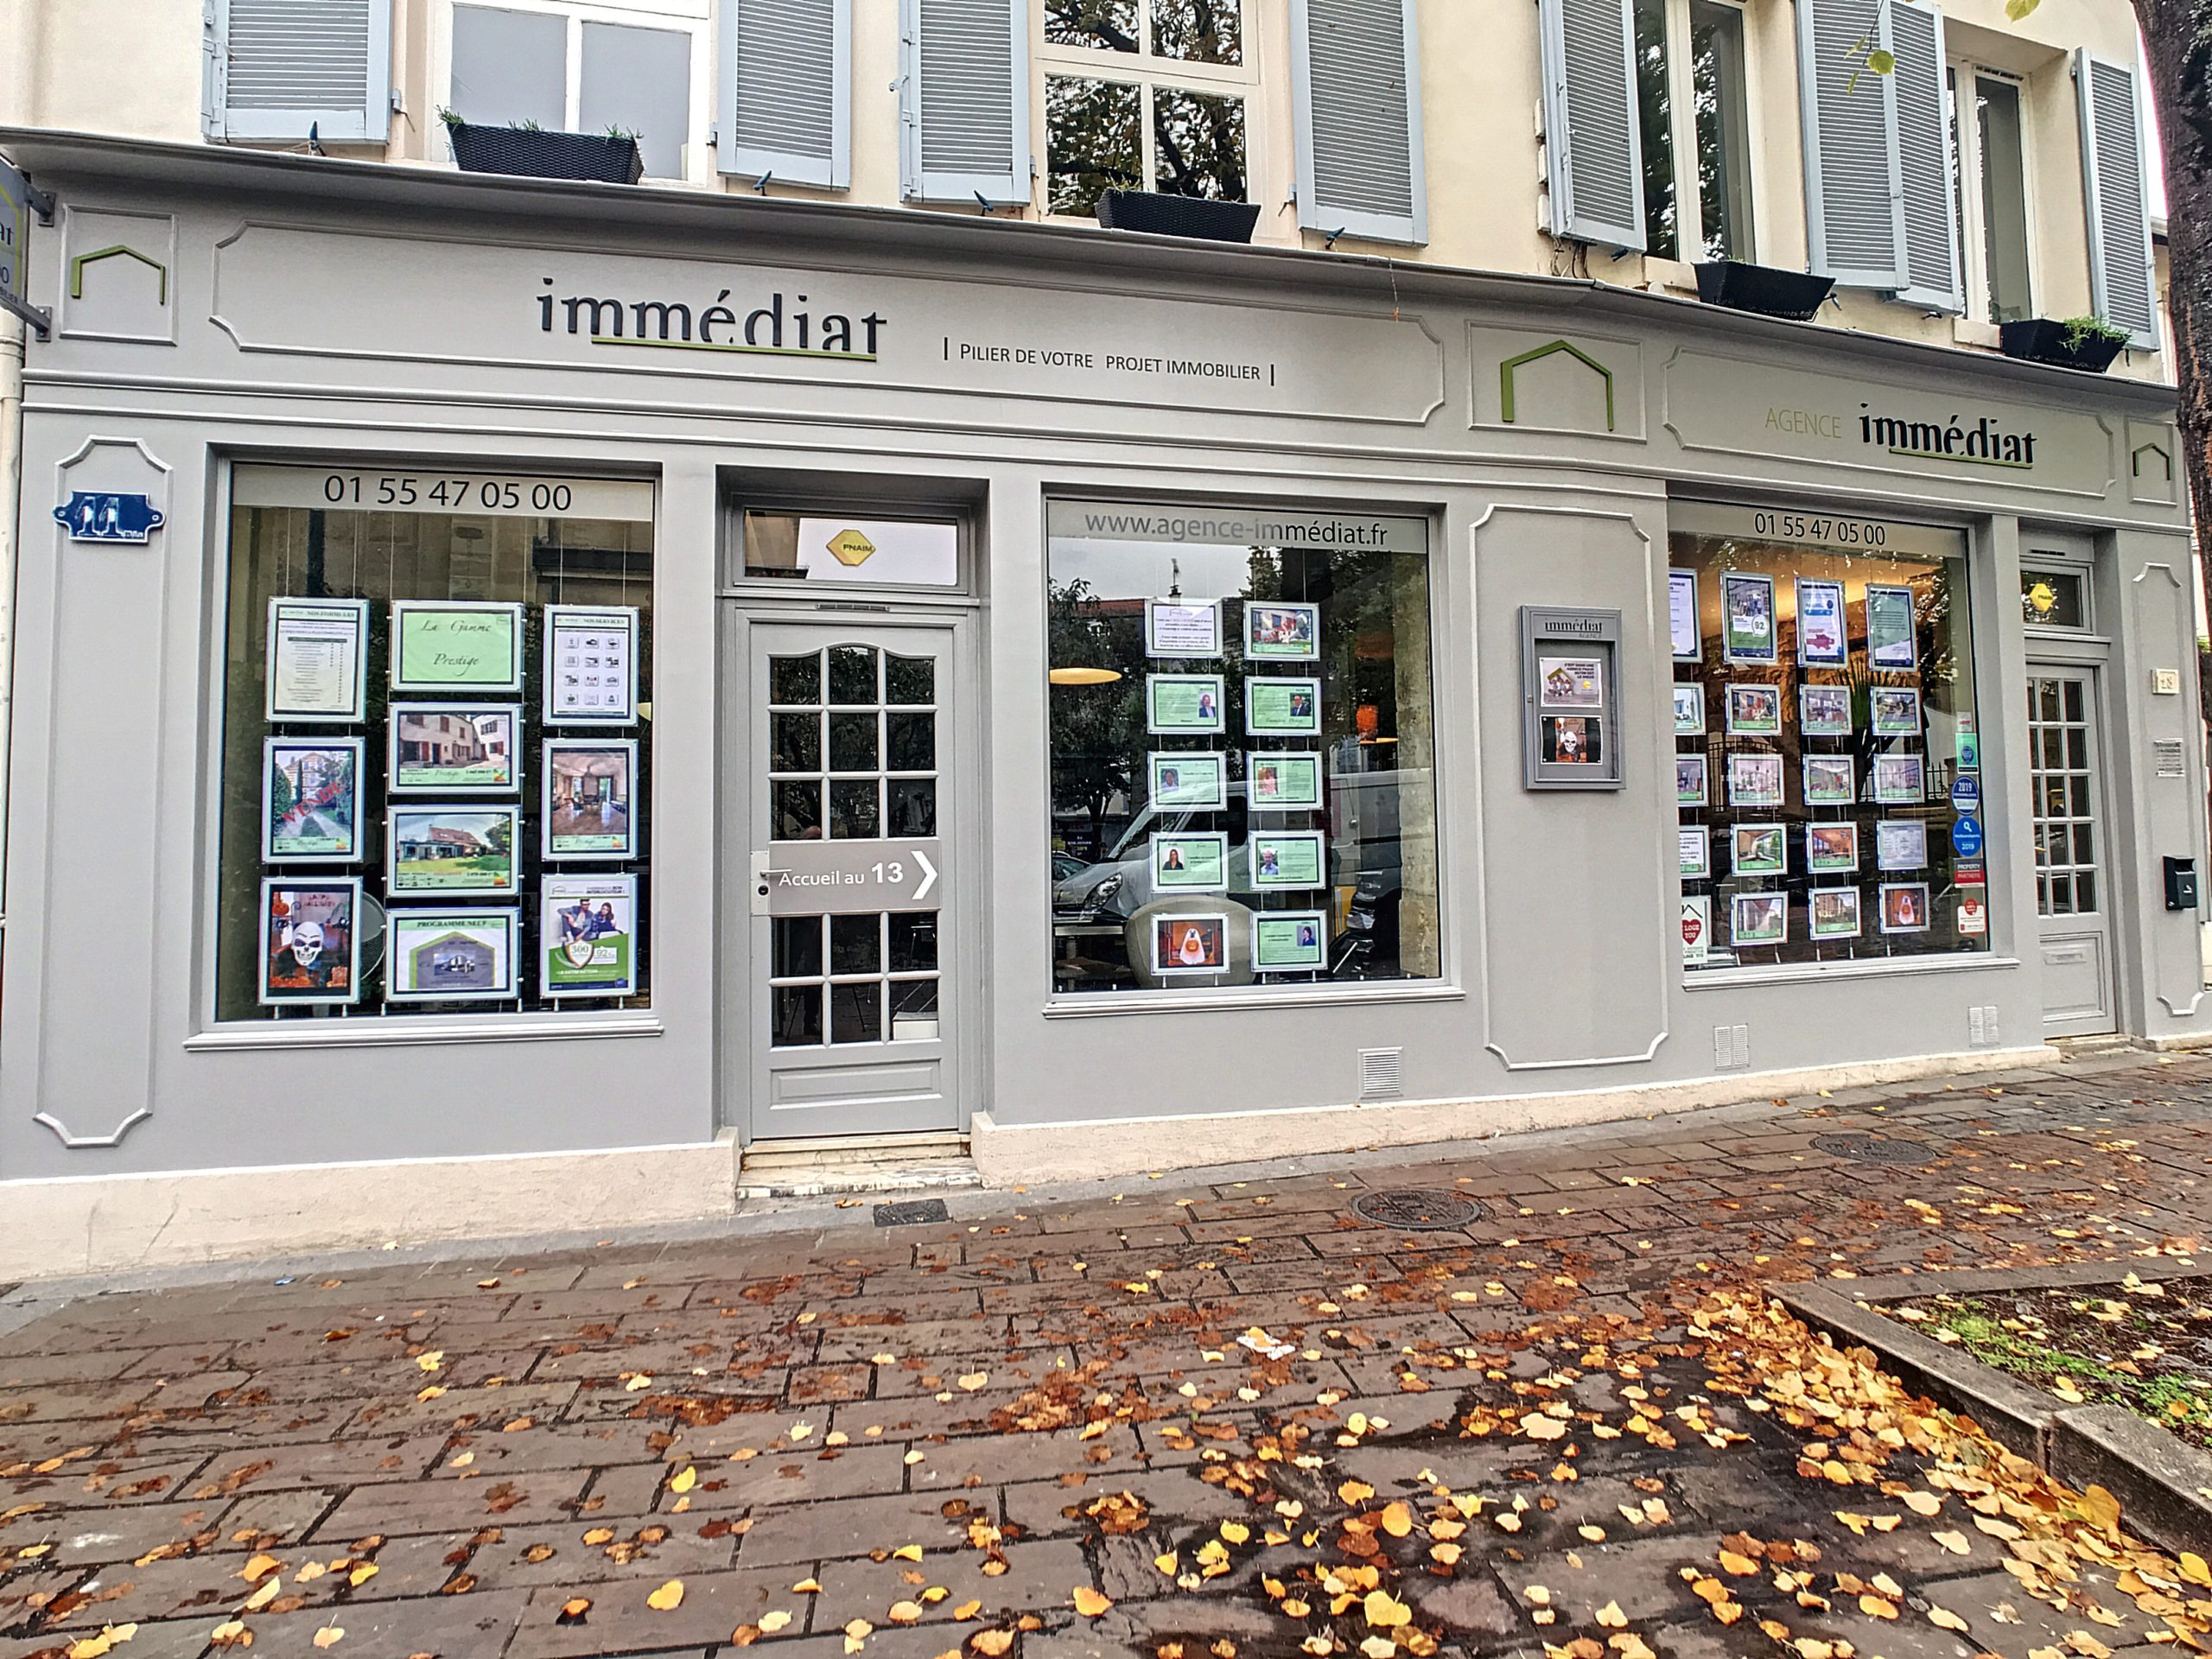 vitrine de l'Agence Immediat à Rueil-Malmaison